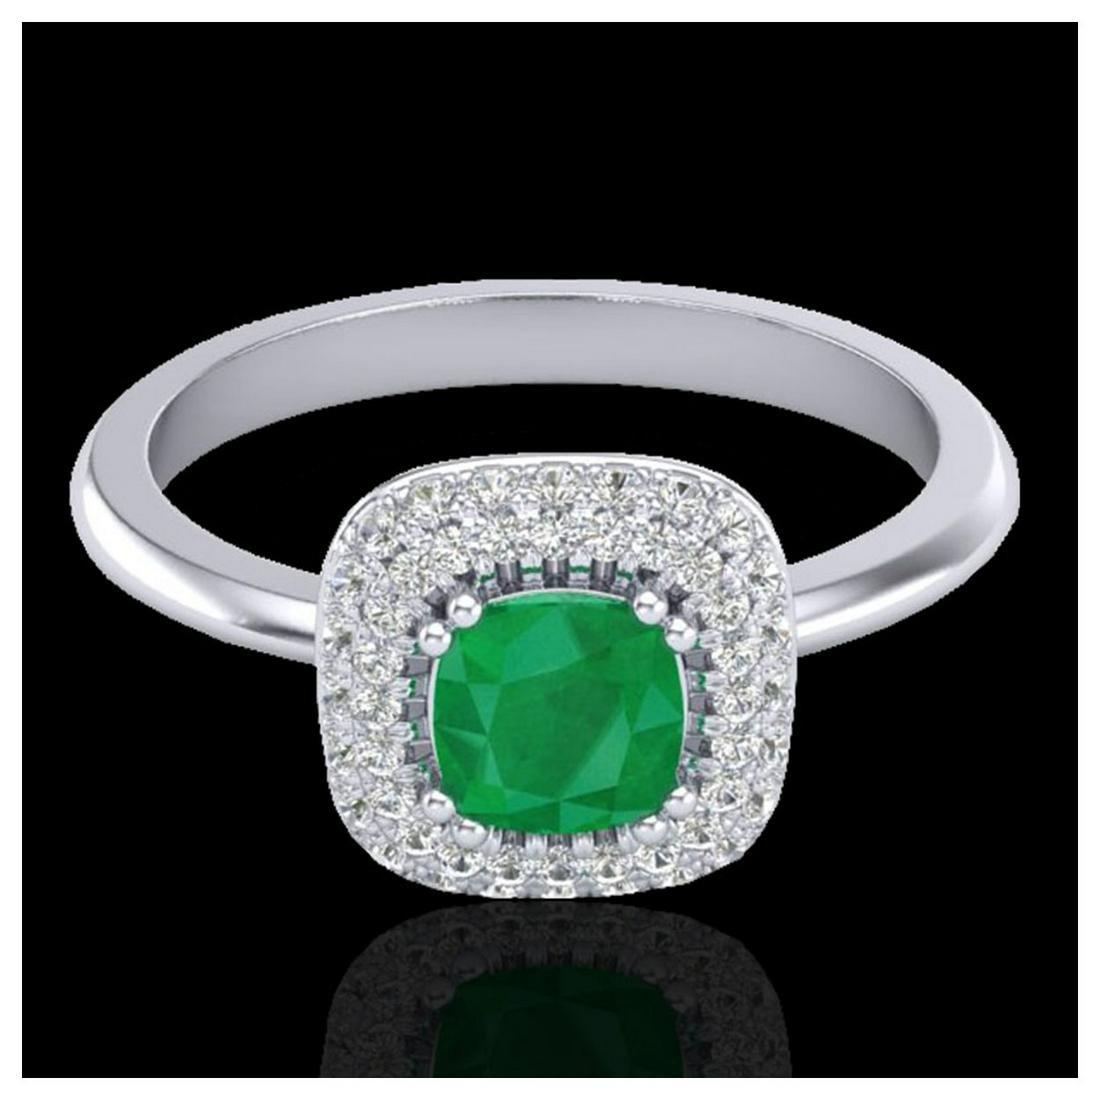 1.16 ctw Emerald & VS/SI Diamond Ring Halo 18K White